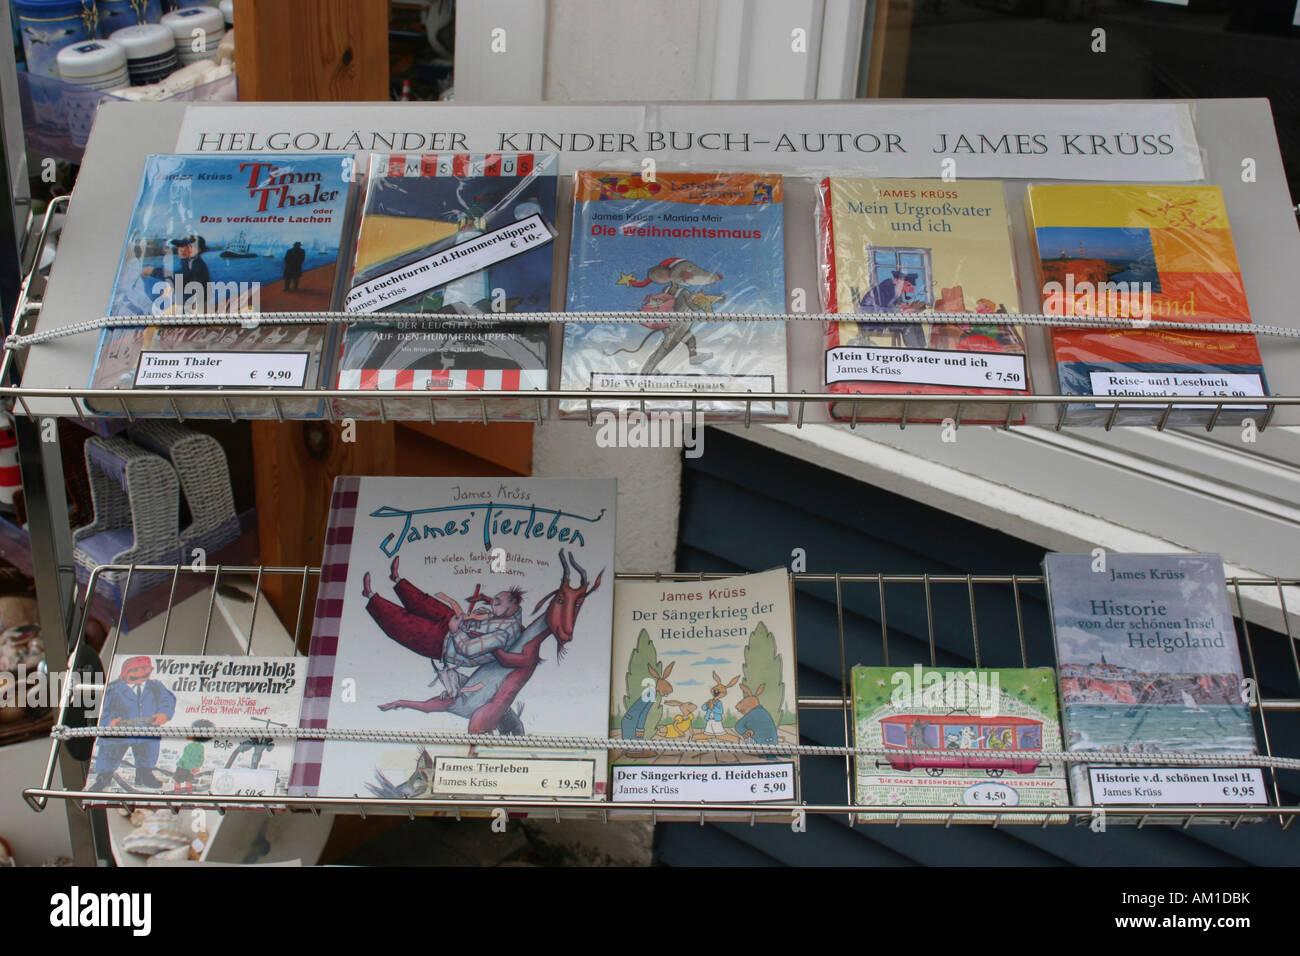 Souvenir shops selling children's books by author James Kruess, Heligoland, Schleswig-Holstein, Germany, Europe Stock Photo